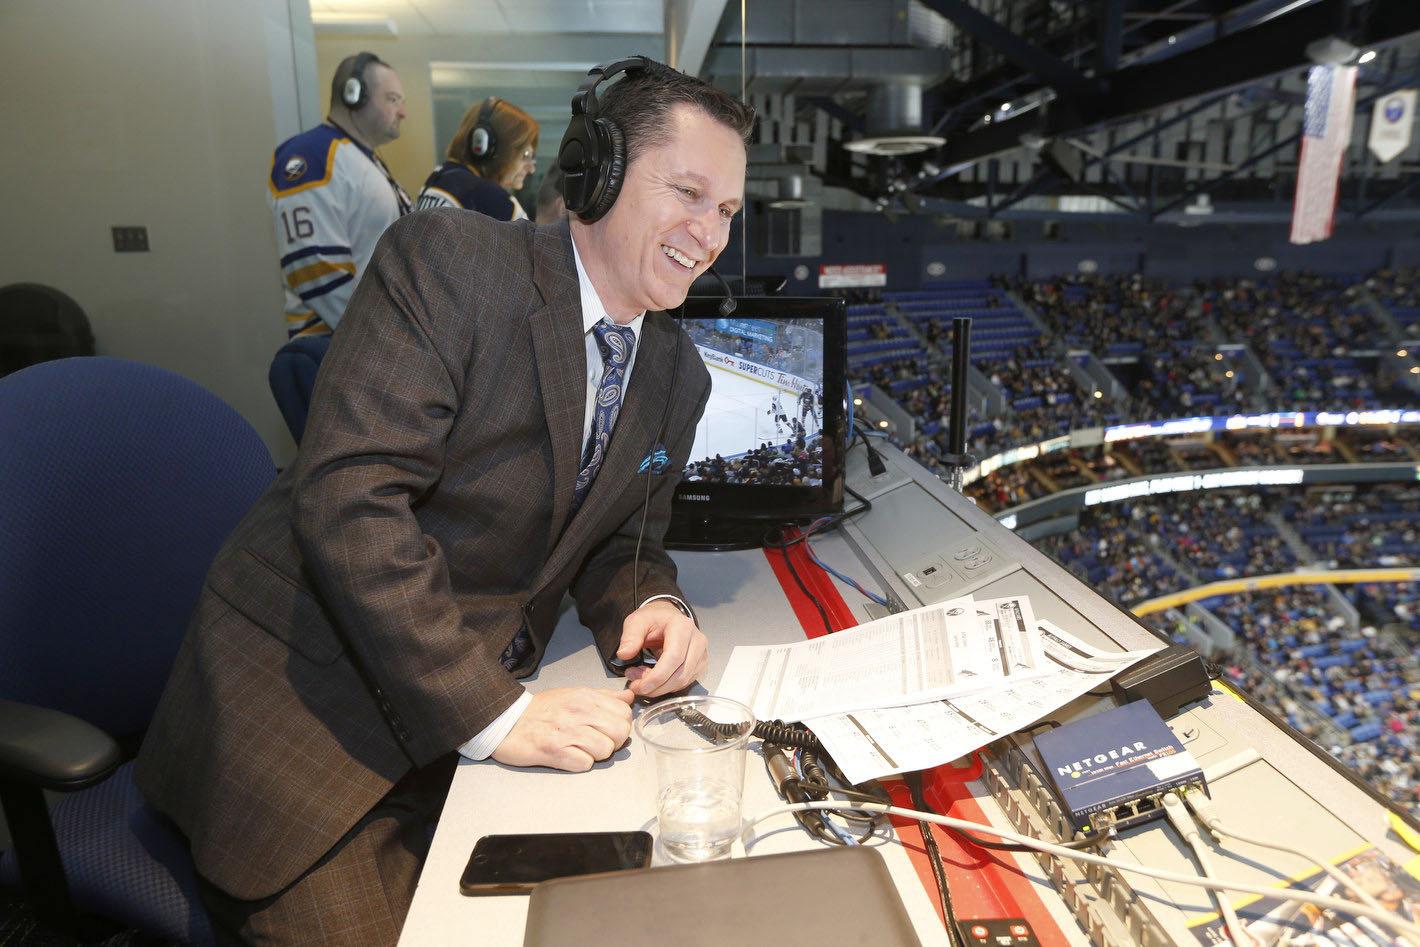 Sabres announcer Dan Dunleavy in the press box. (Robert Kirkham/News file photo)